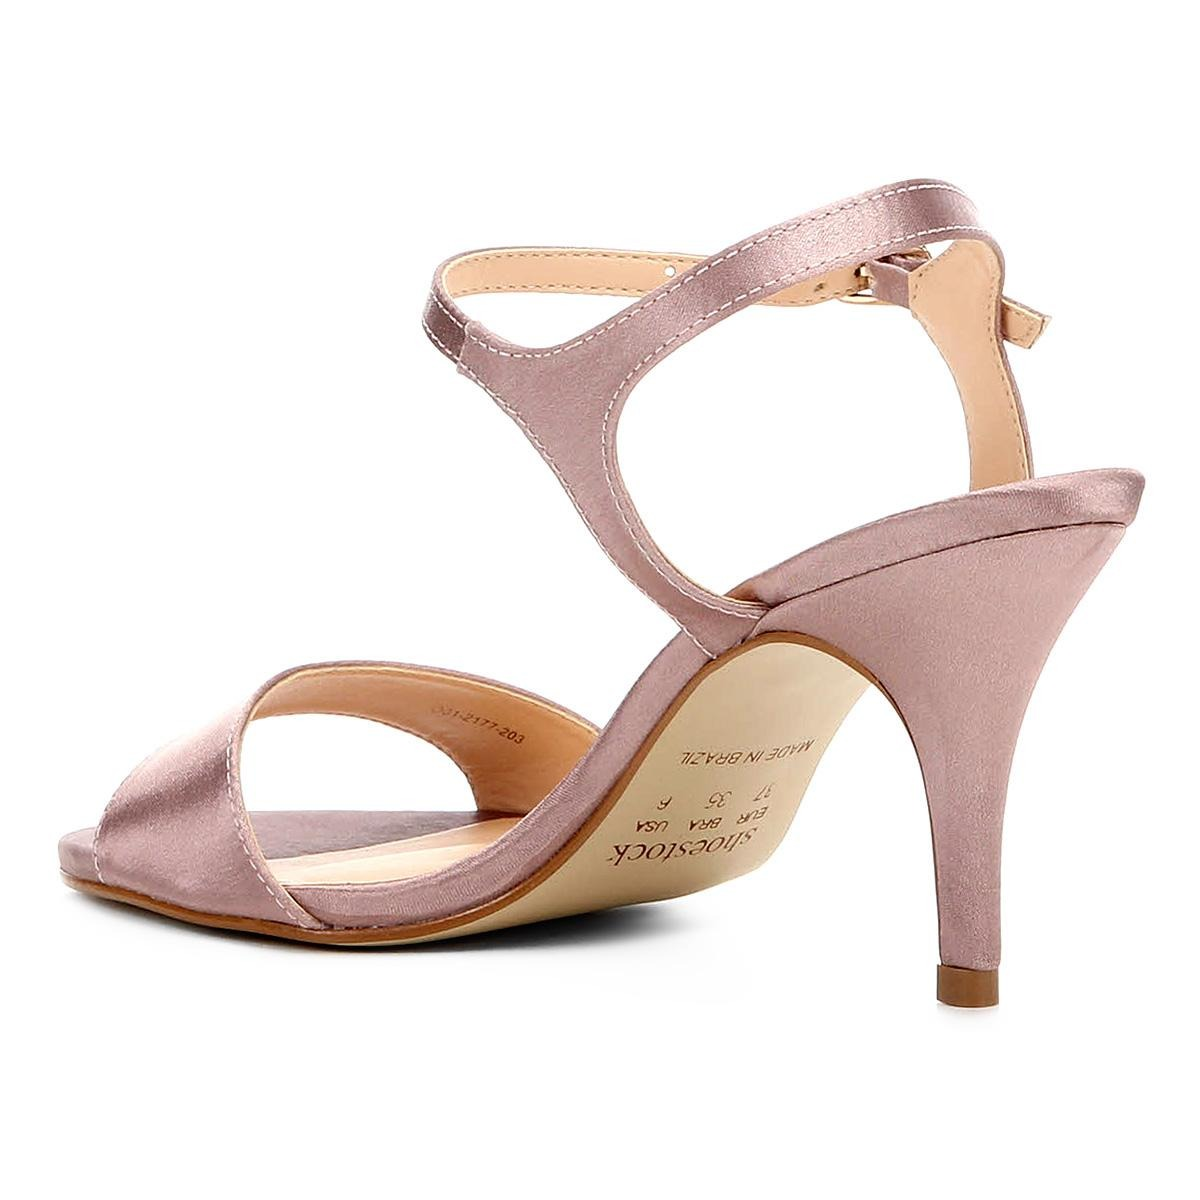 58980fa88a sandália shoestock salto fino cetim feminina. Carregando zoom.